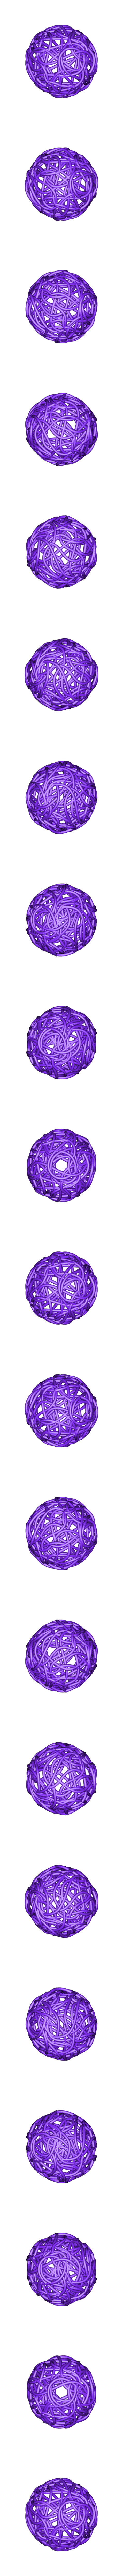 boule_deco_v4-01.STL Download free STL file Decorative ball V.4 • Design to 3D print, Tibe-Design